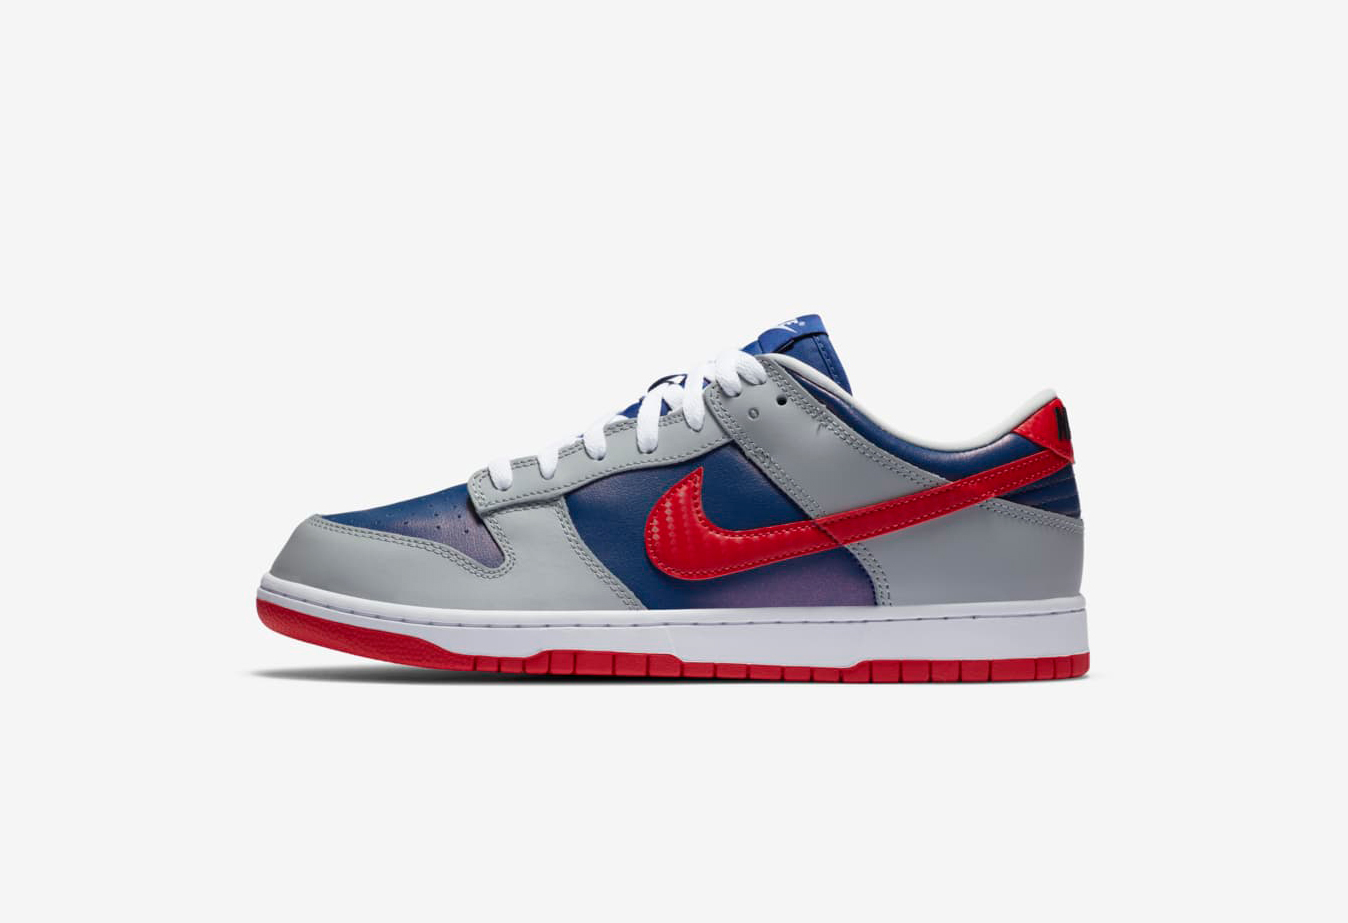 Nike,SNRKS,已经,上架,奥特曼,Dunk,Low,  Nike SNRKS 已经上架!奥特曼 Nike Dunk Low 即将发售!